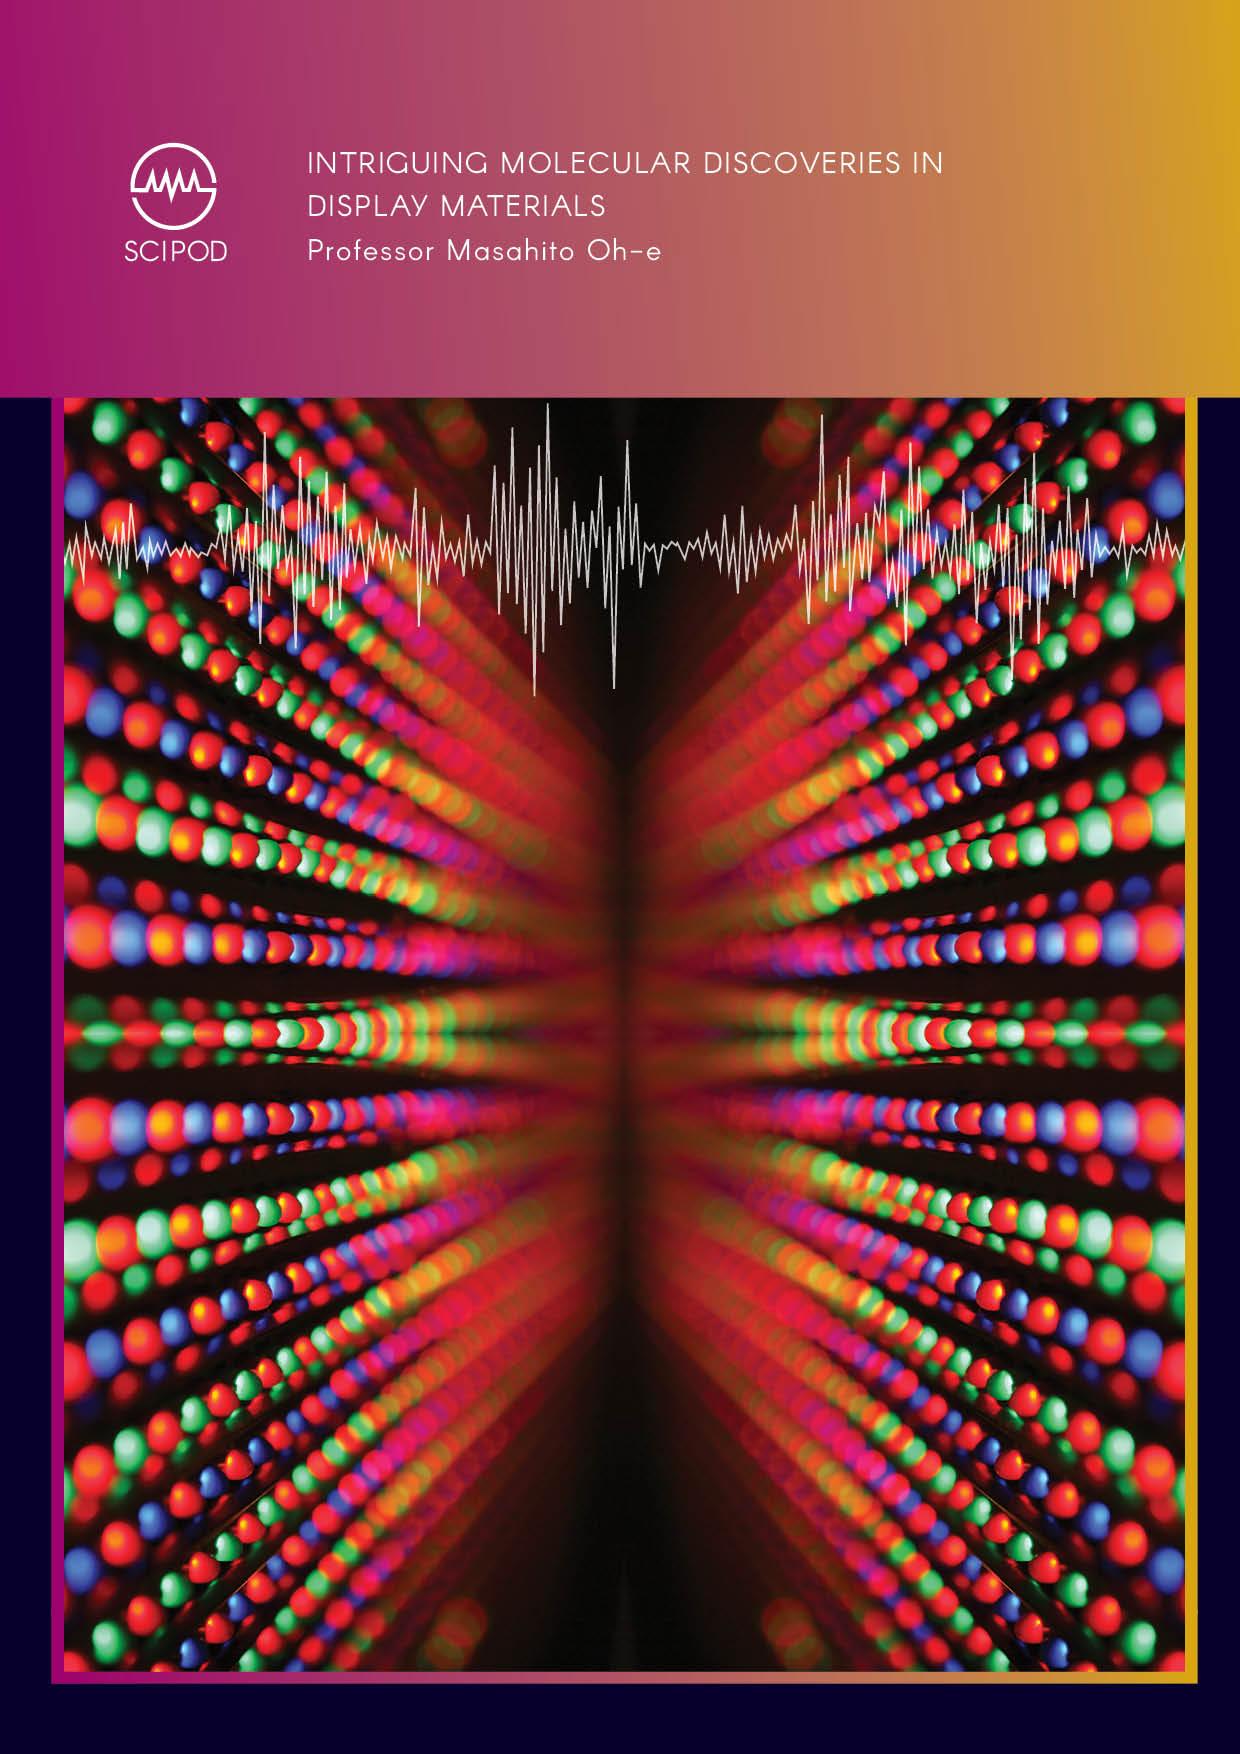 Professor Masahito Oh-e – Intriguing Molecular Discoveries in Display Materials